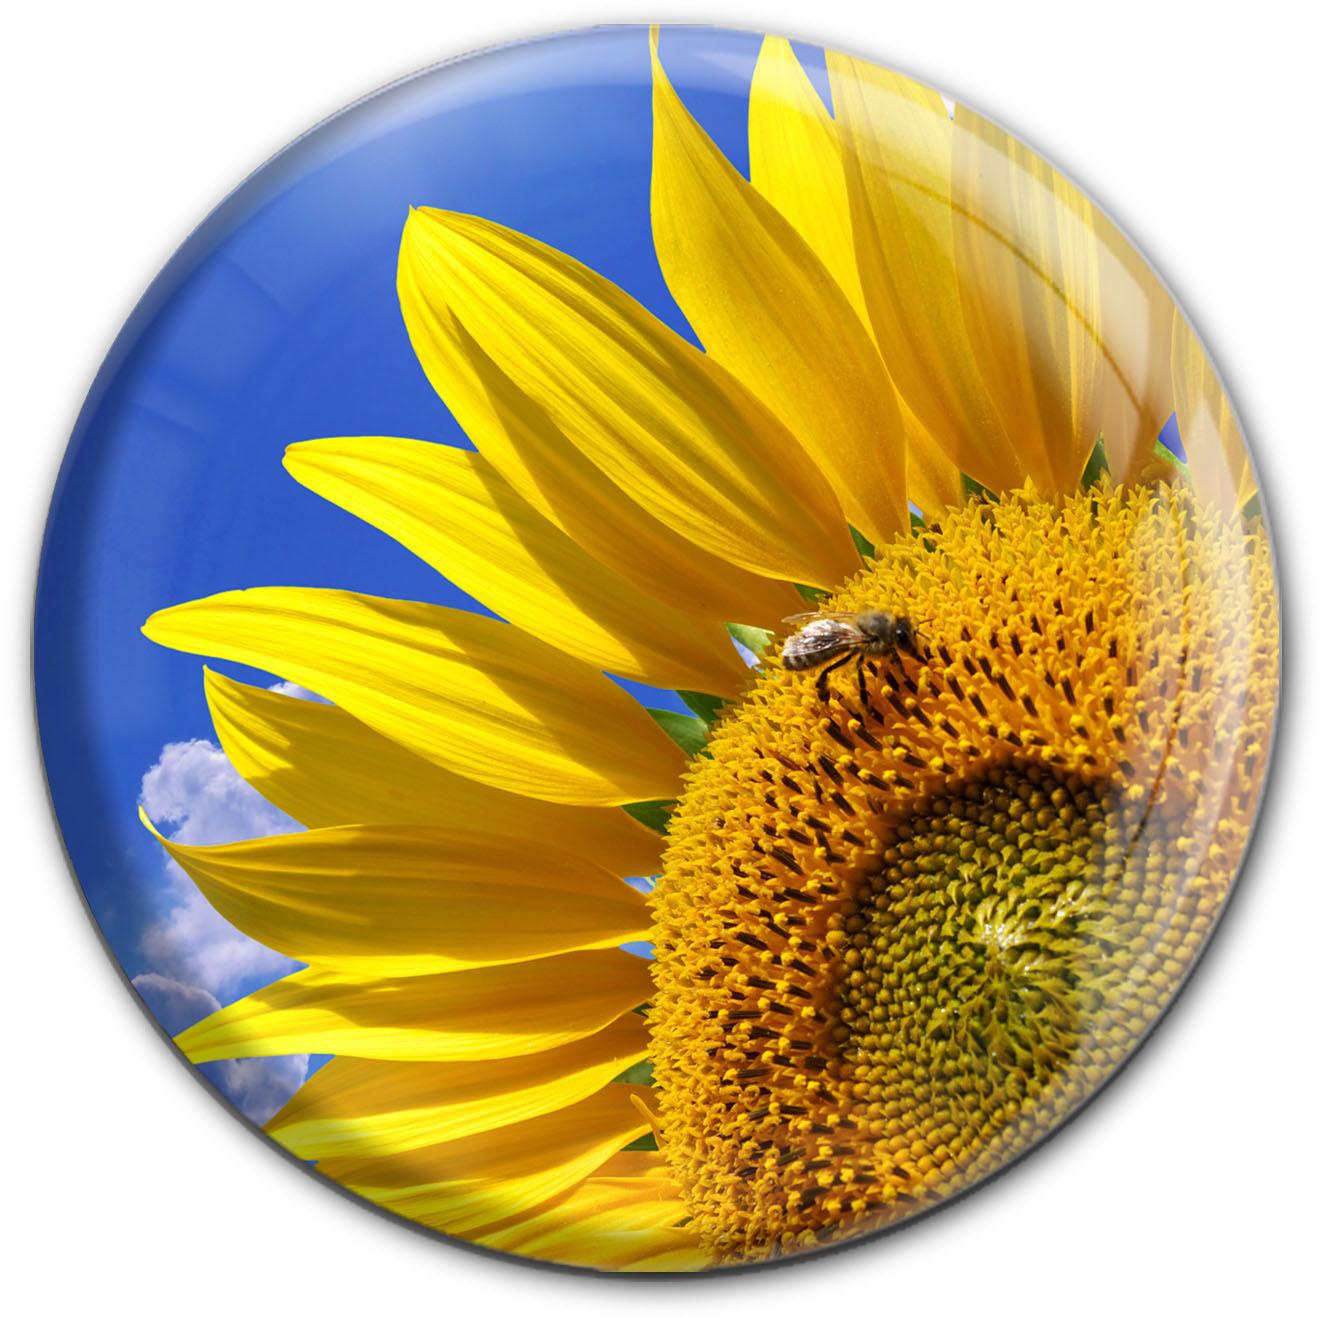 Magnet / Kühlschrankmagnet / Sonnenblume